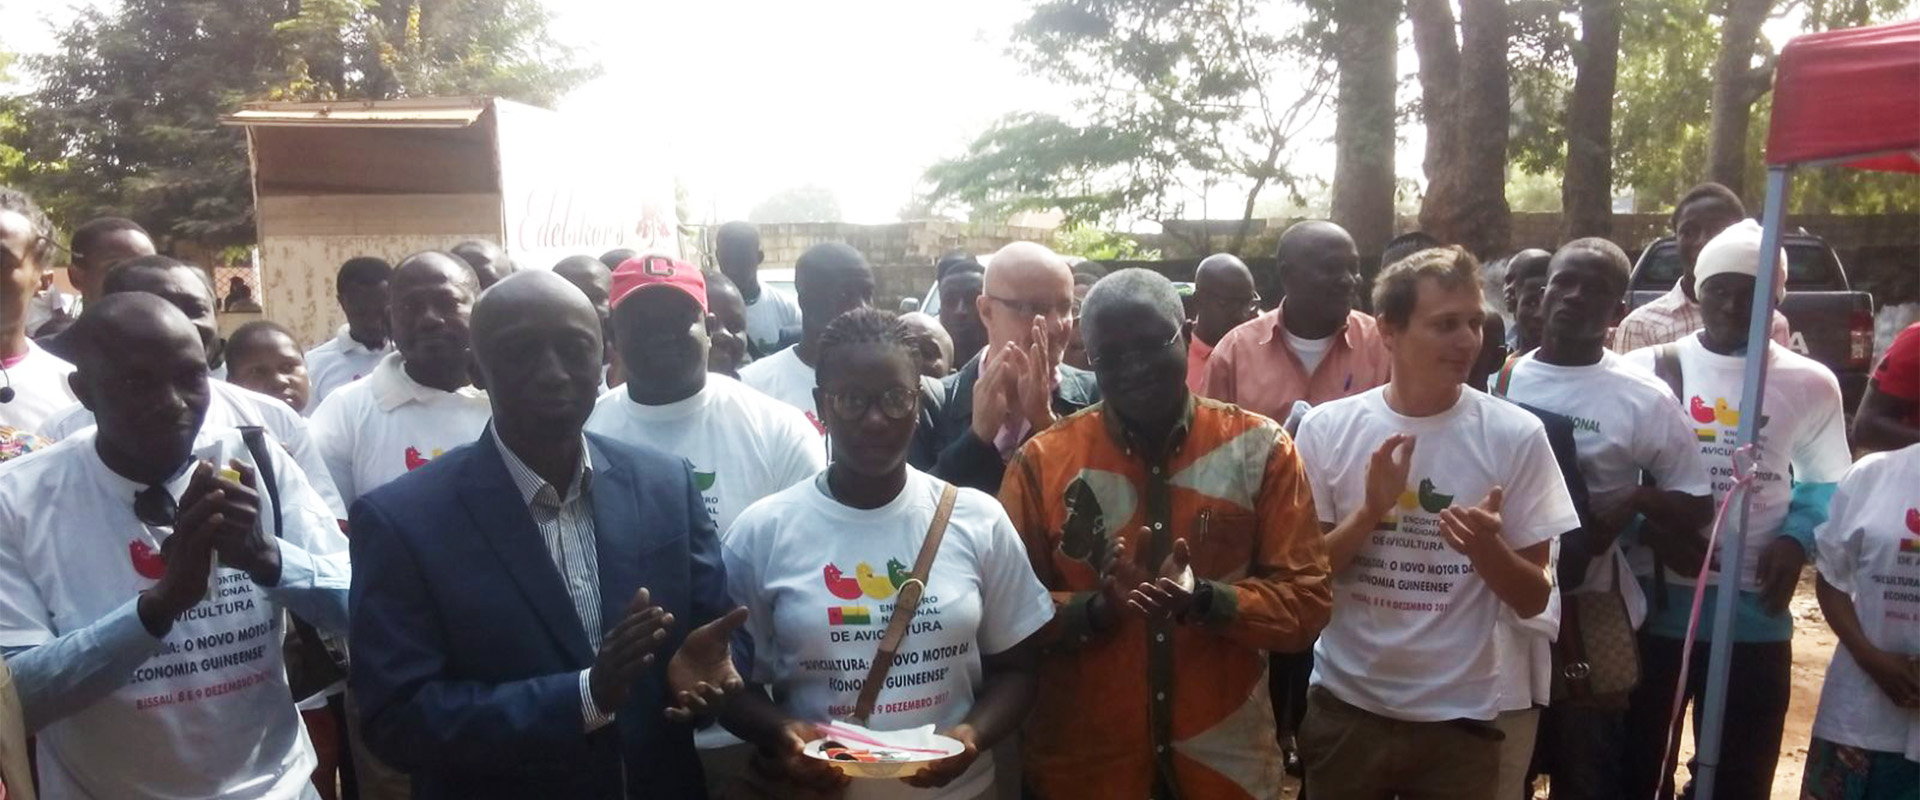 incontro fiera avicoltura Guinea Bissau Mani Tese 2018